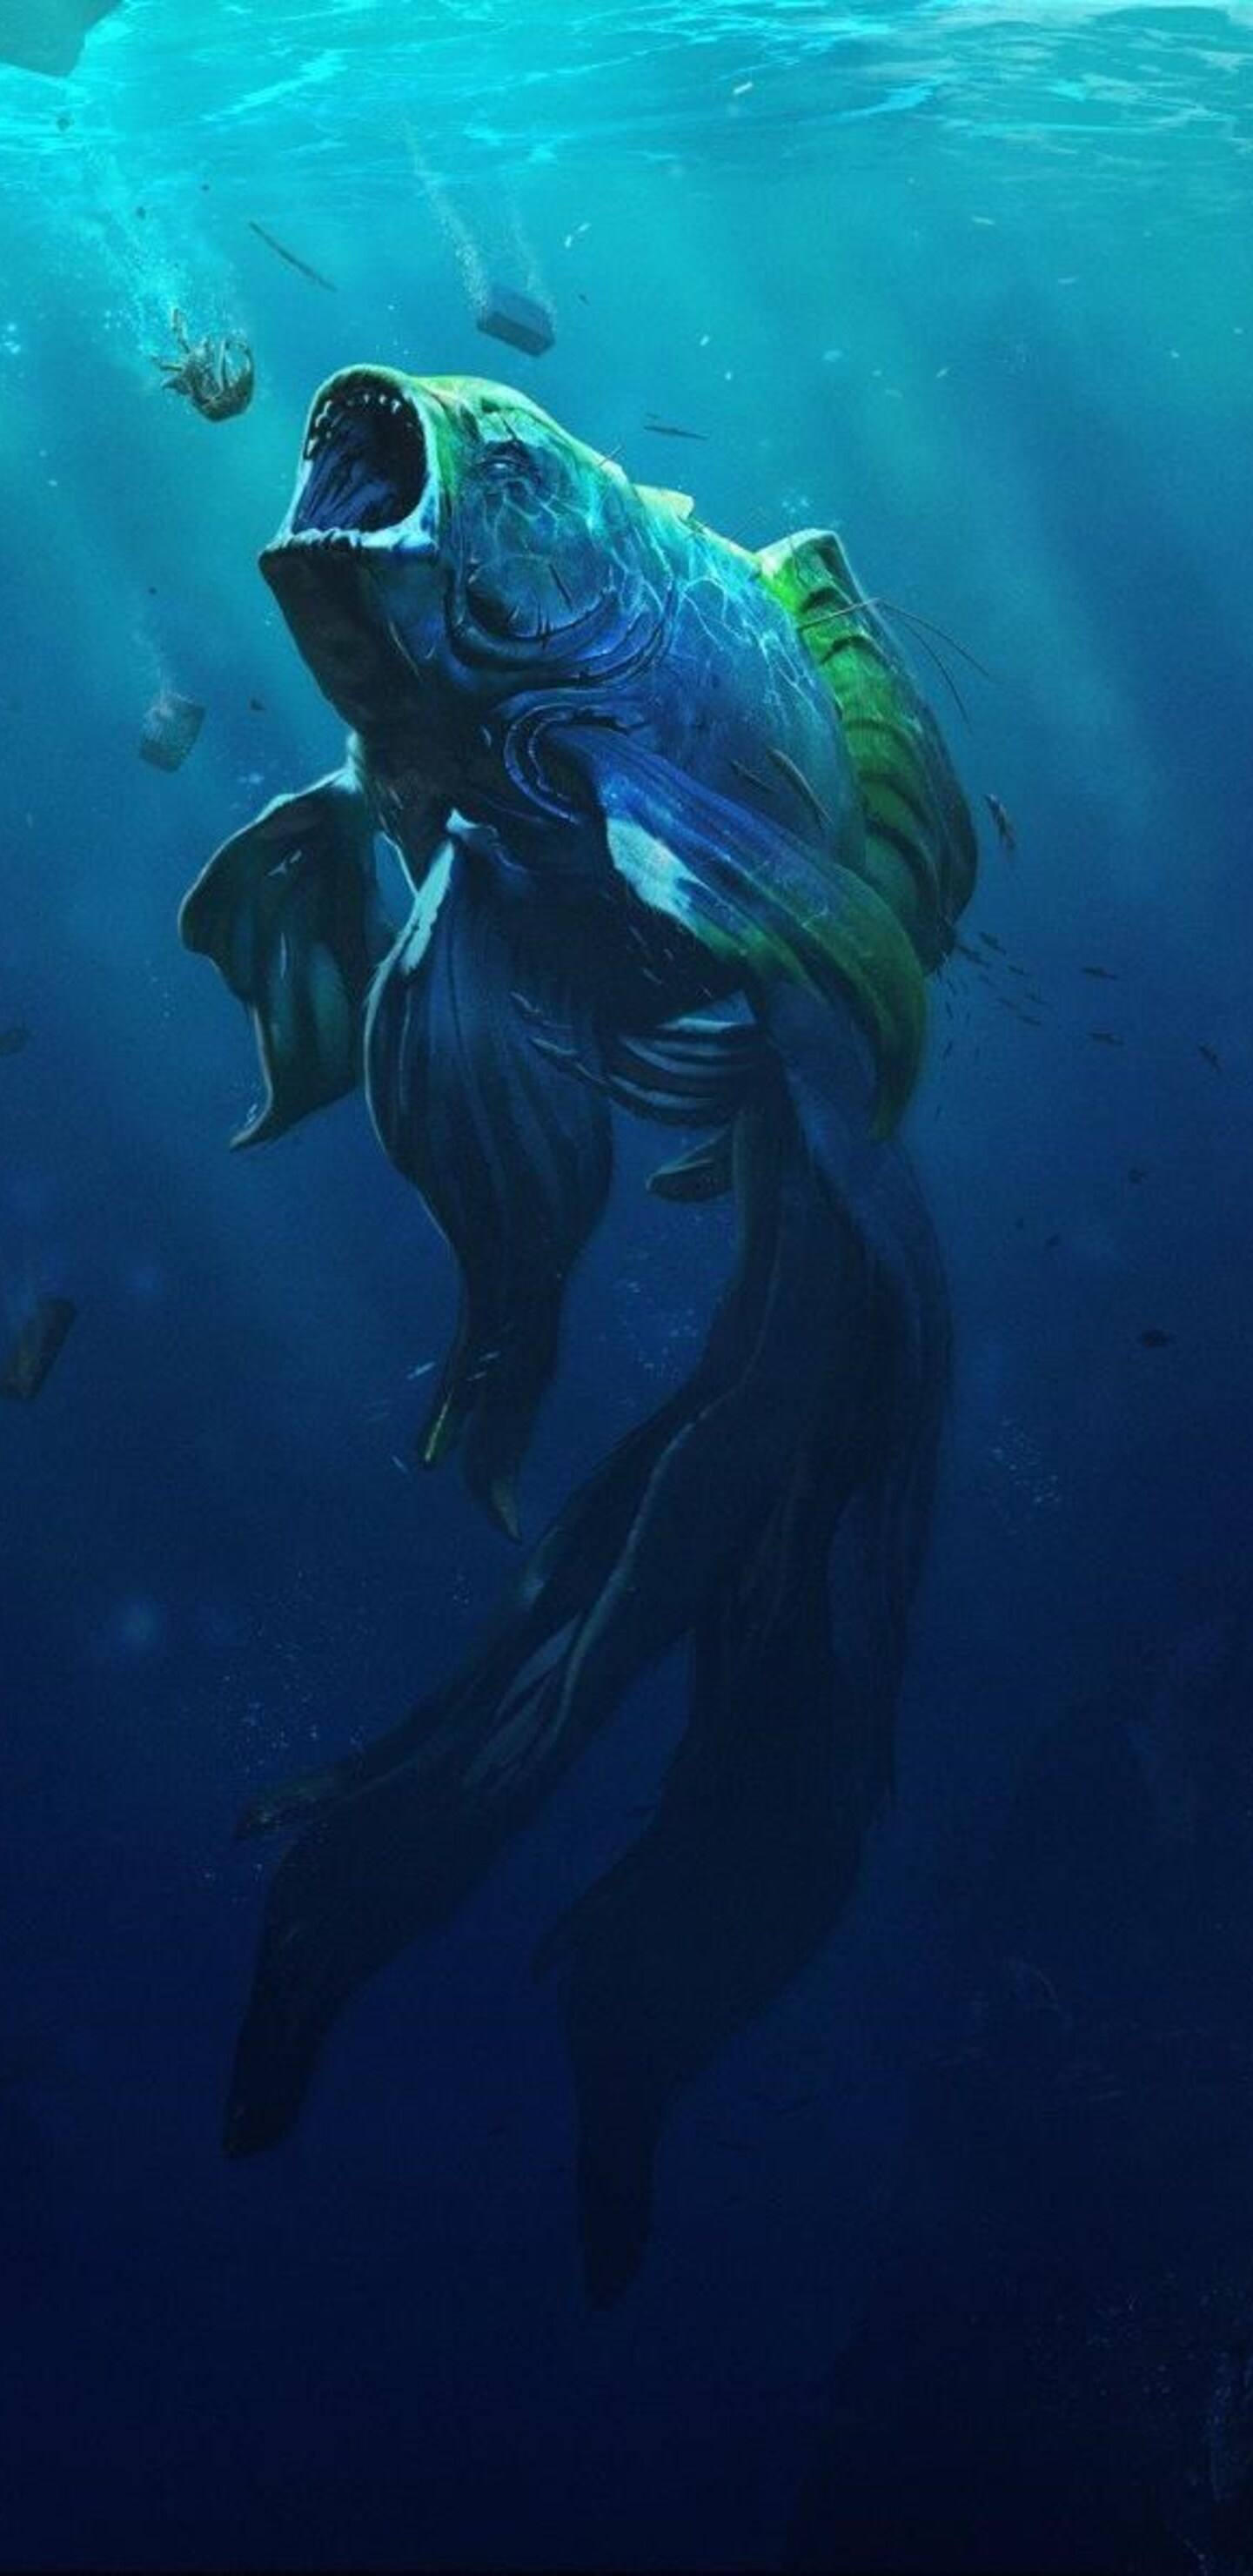 1440x2960 goldfish piranha samsung galaxy note 9,8, s9,s8,s8+ qhd hd